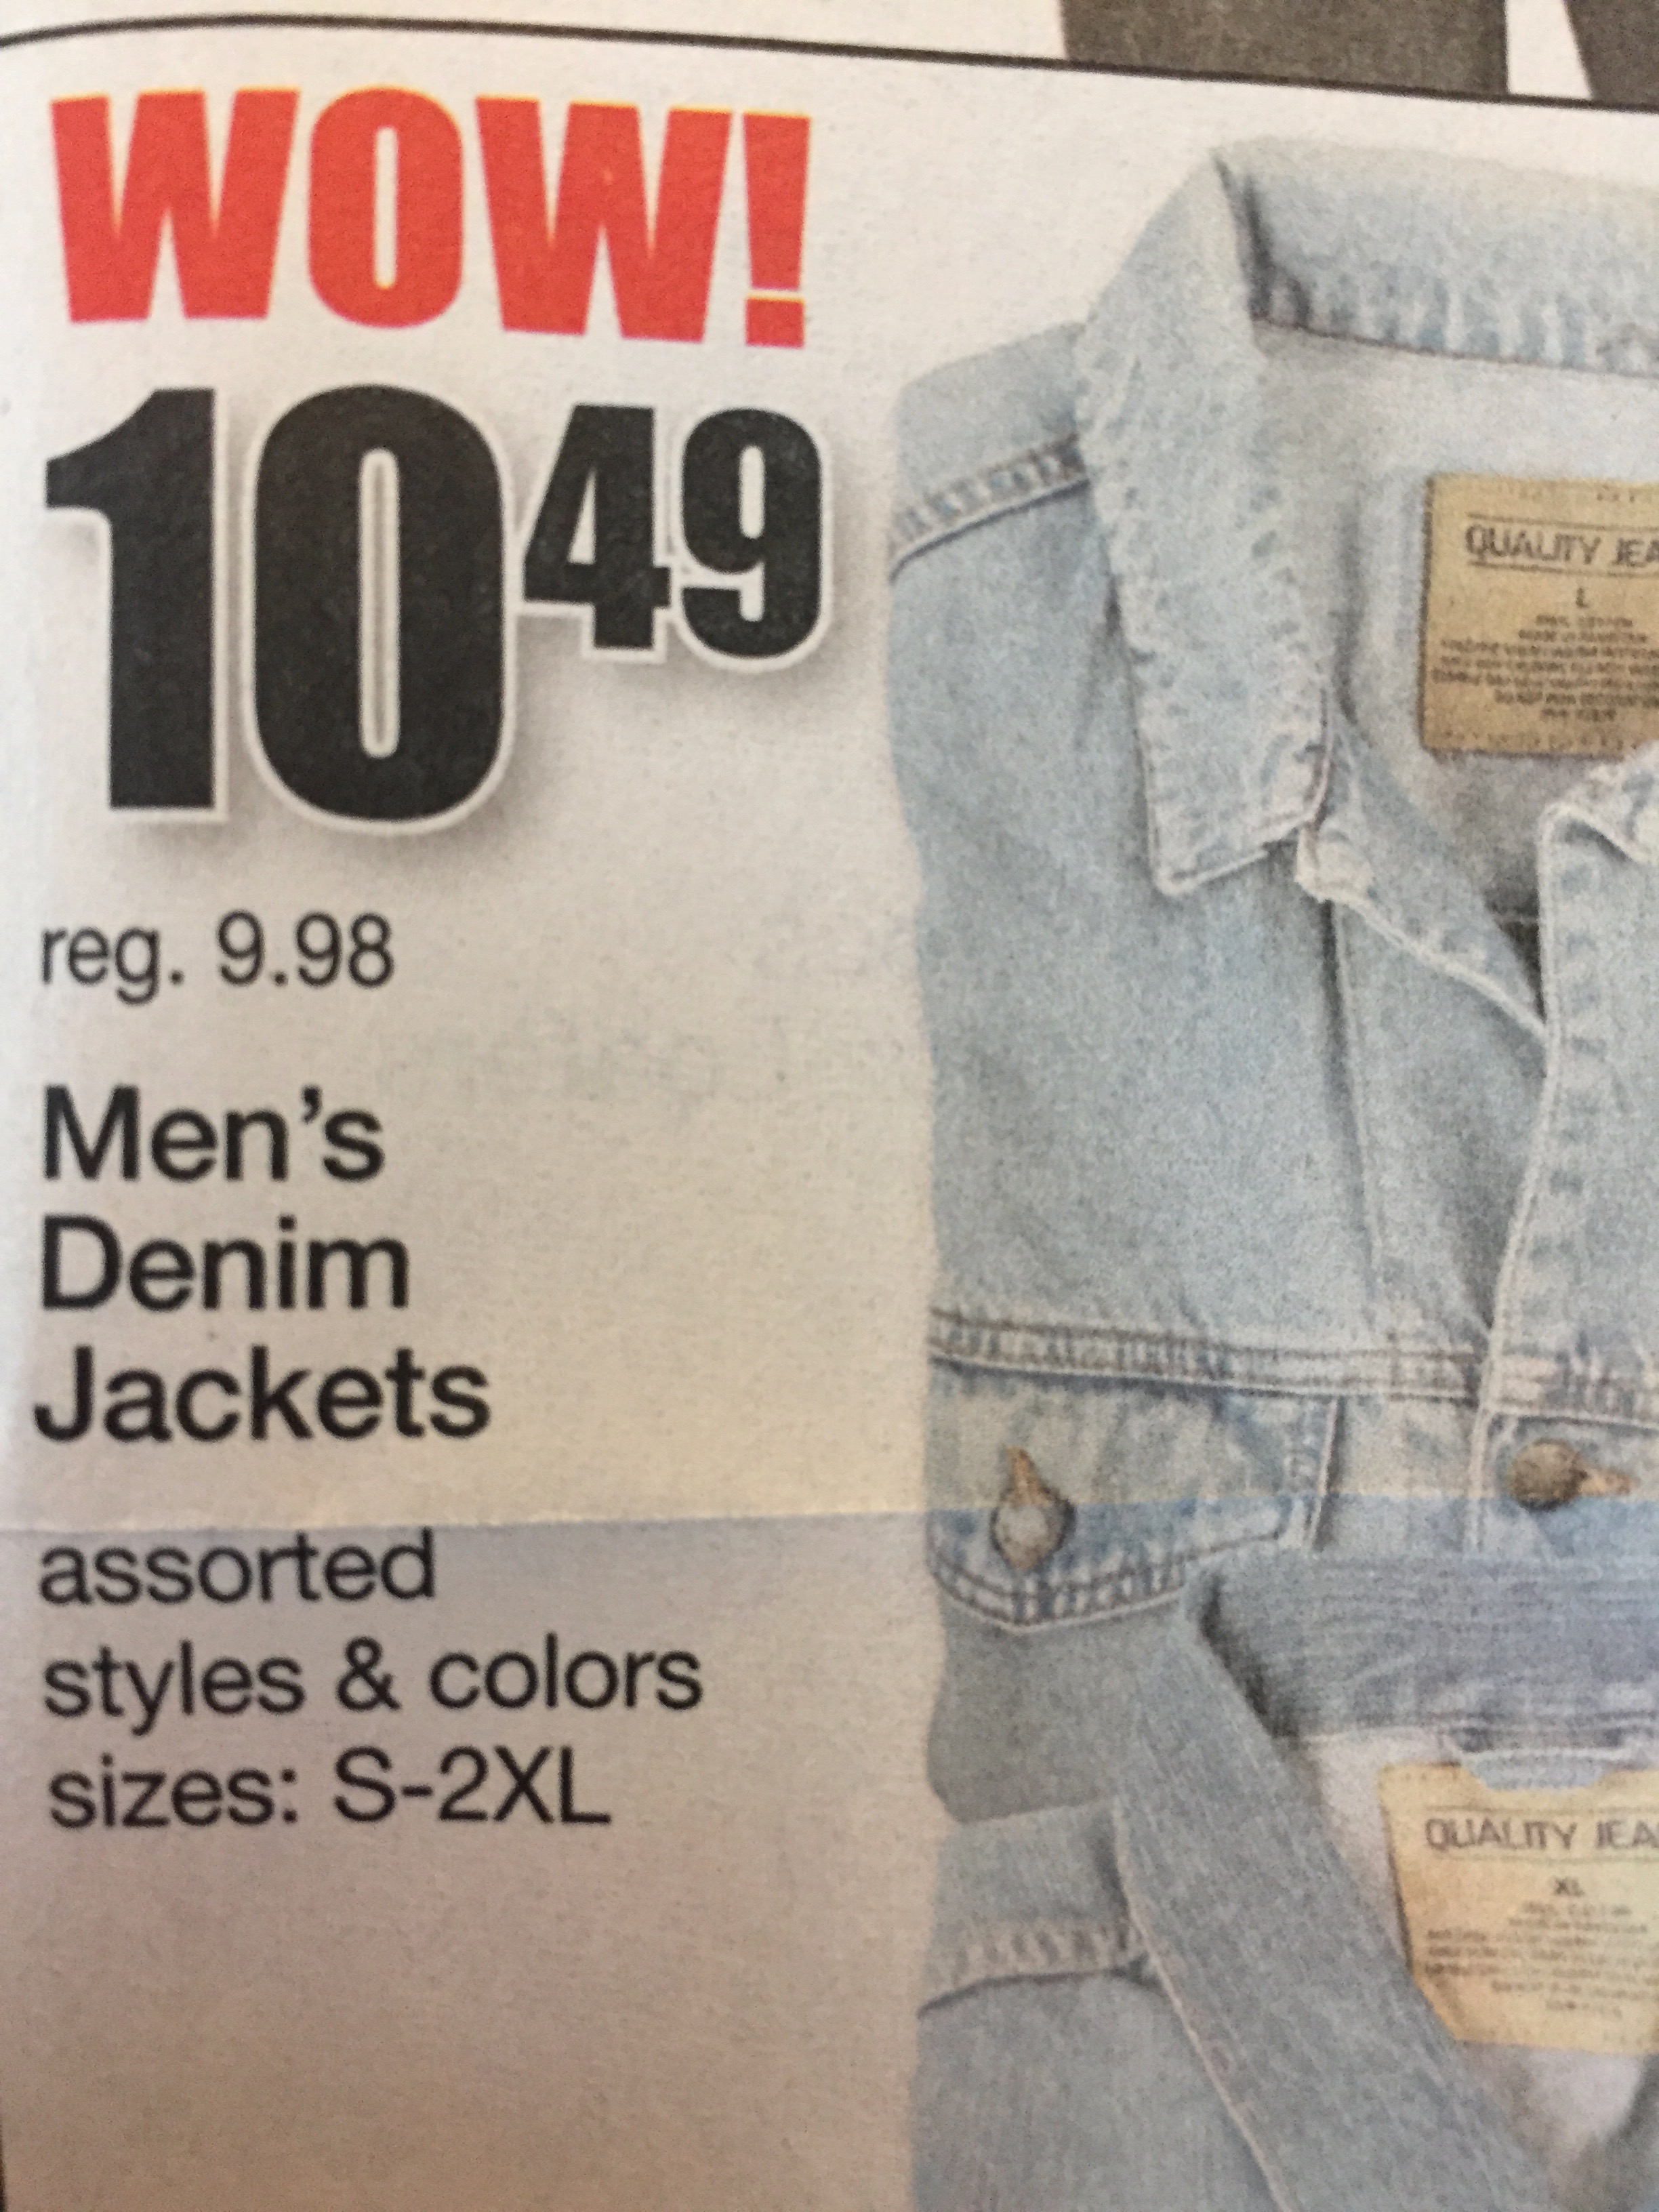 Wow jacket price.jpg